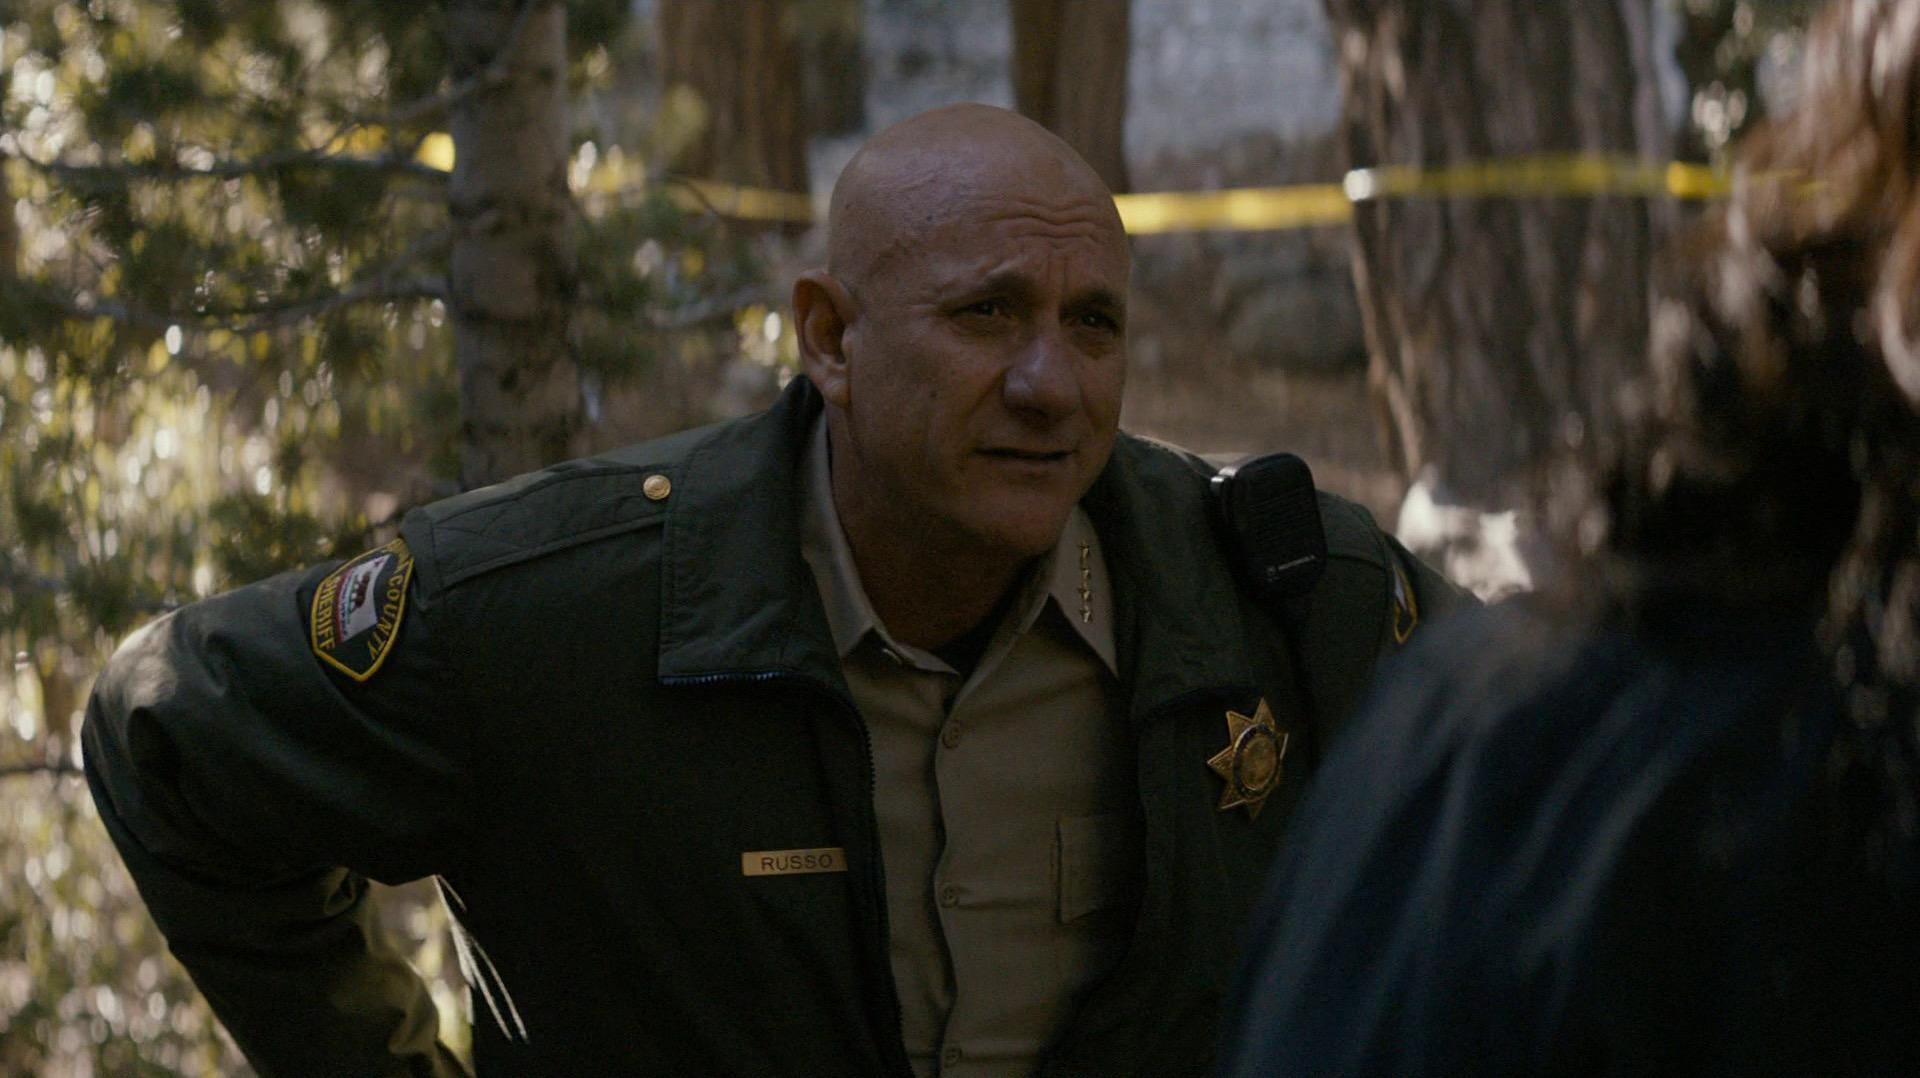 Sonoma County Sheriff Russo